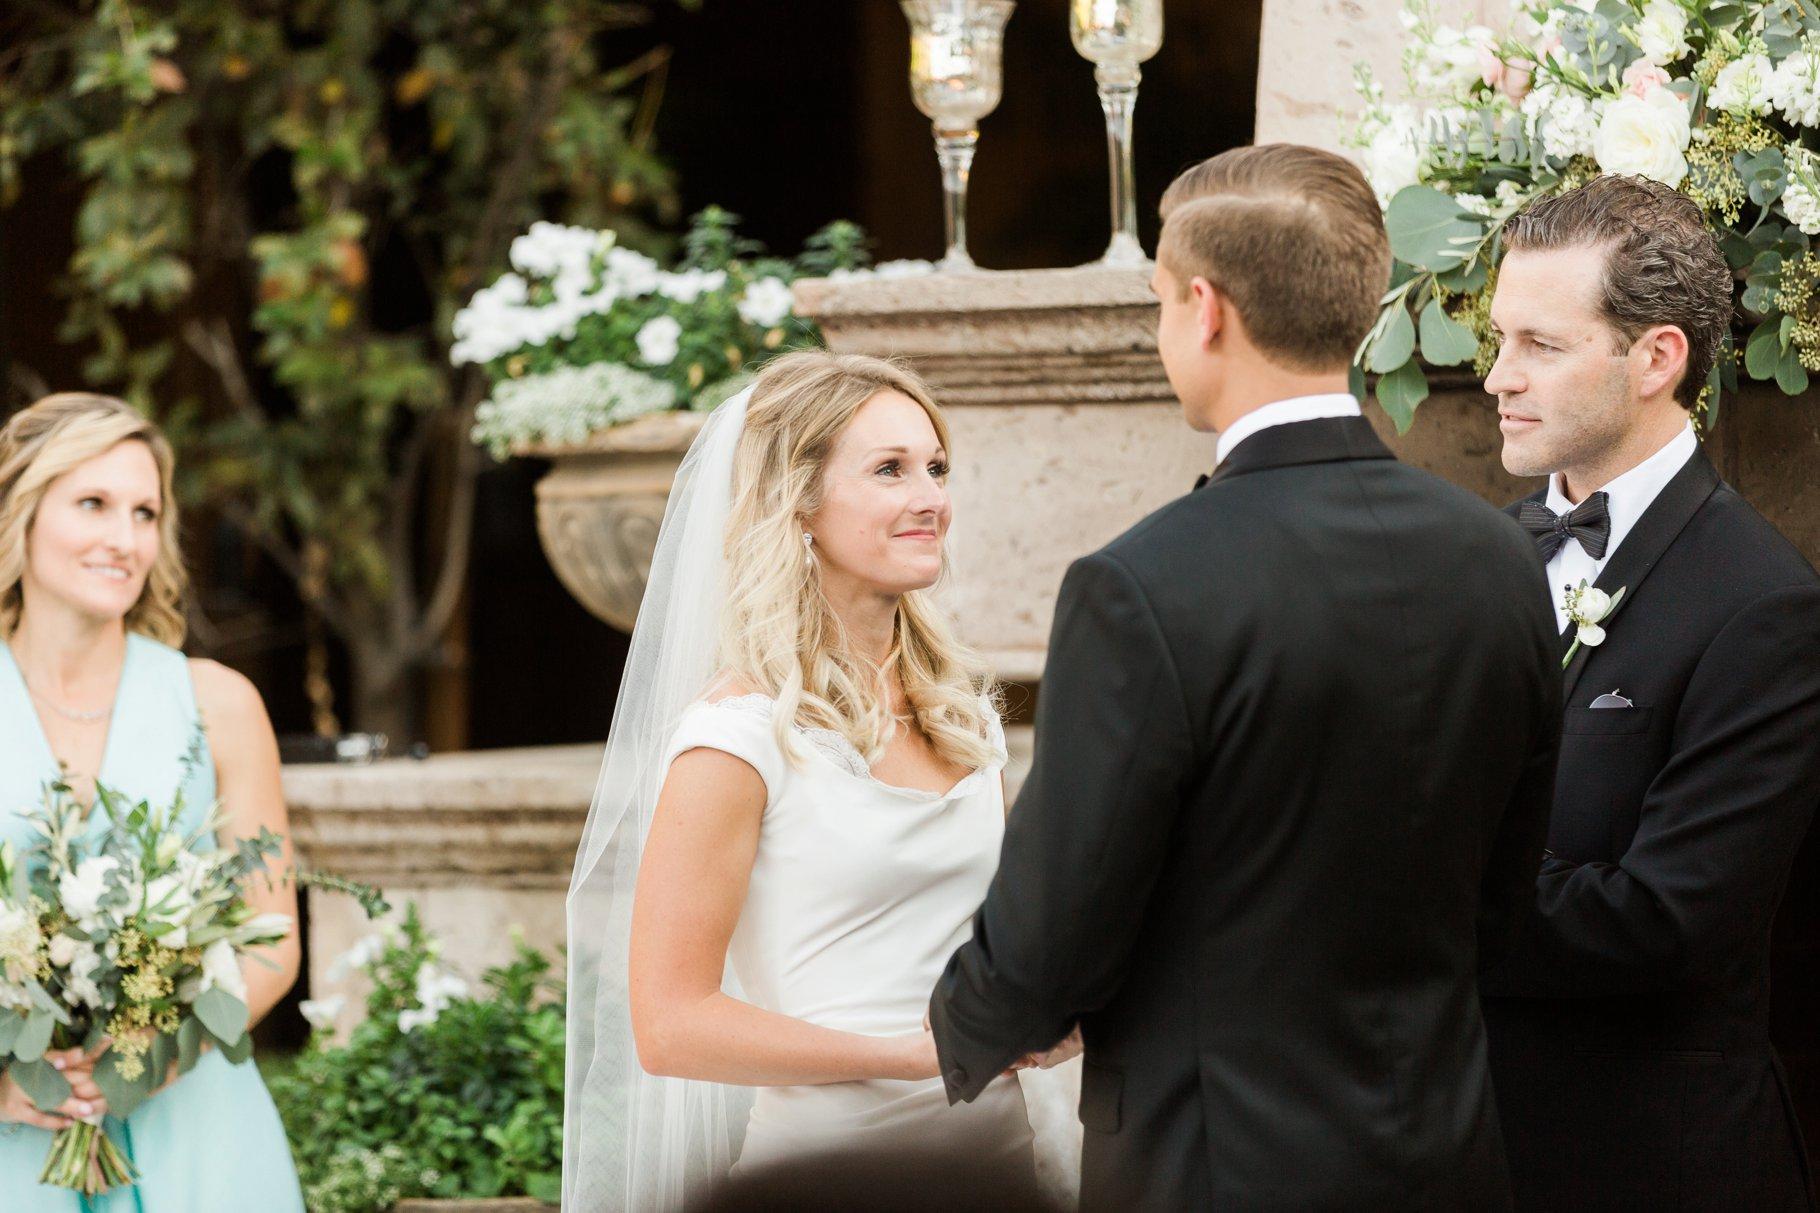 villa siena wedding-079_GRETCHEN WAKEMAN PHOTOGRAPHY.jpg